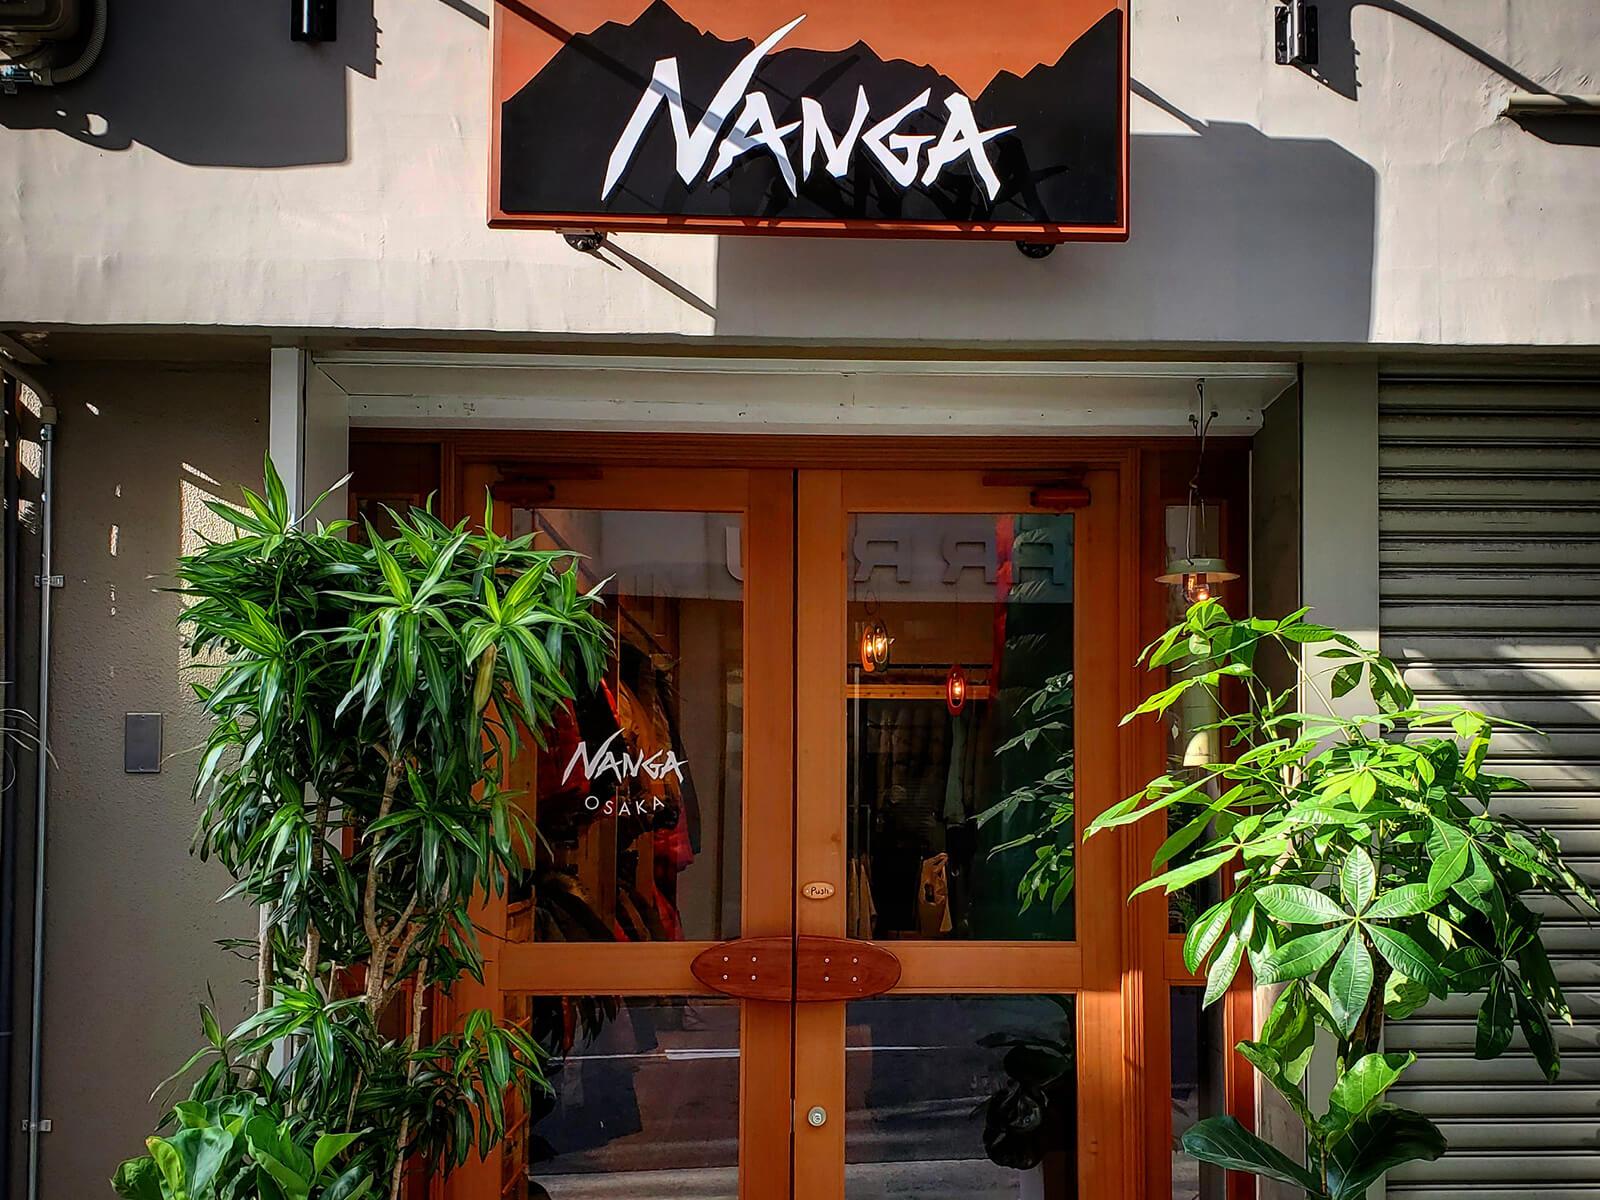 NANGA SHOP OSAKA